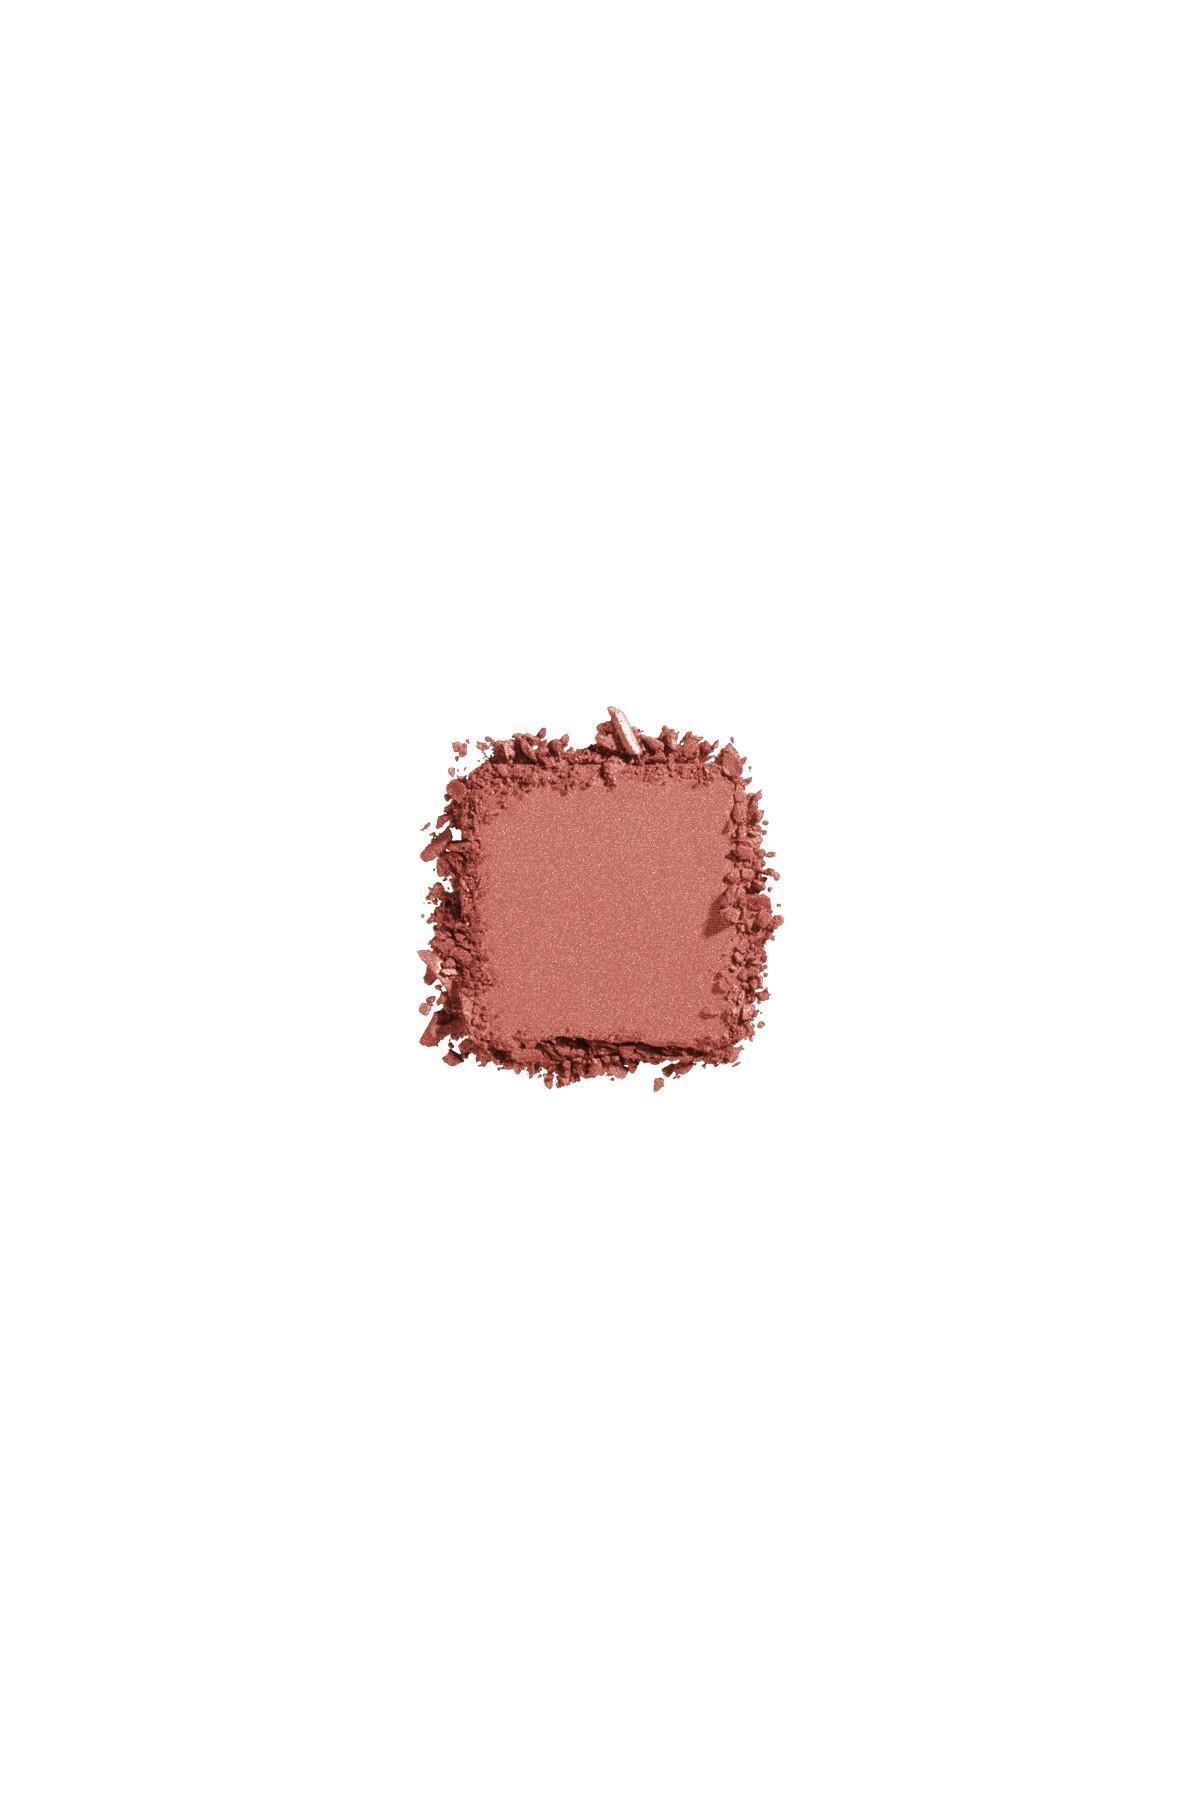 NYX Professional Makeup Işıltı Veren Allık - Sweet Cheeks Creamy Powder Blush Glow - Summer Breeze 800897192372 2